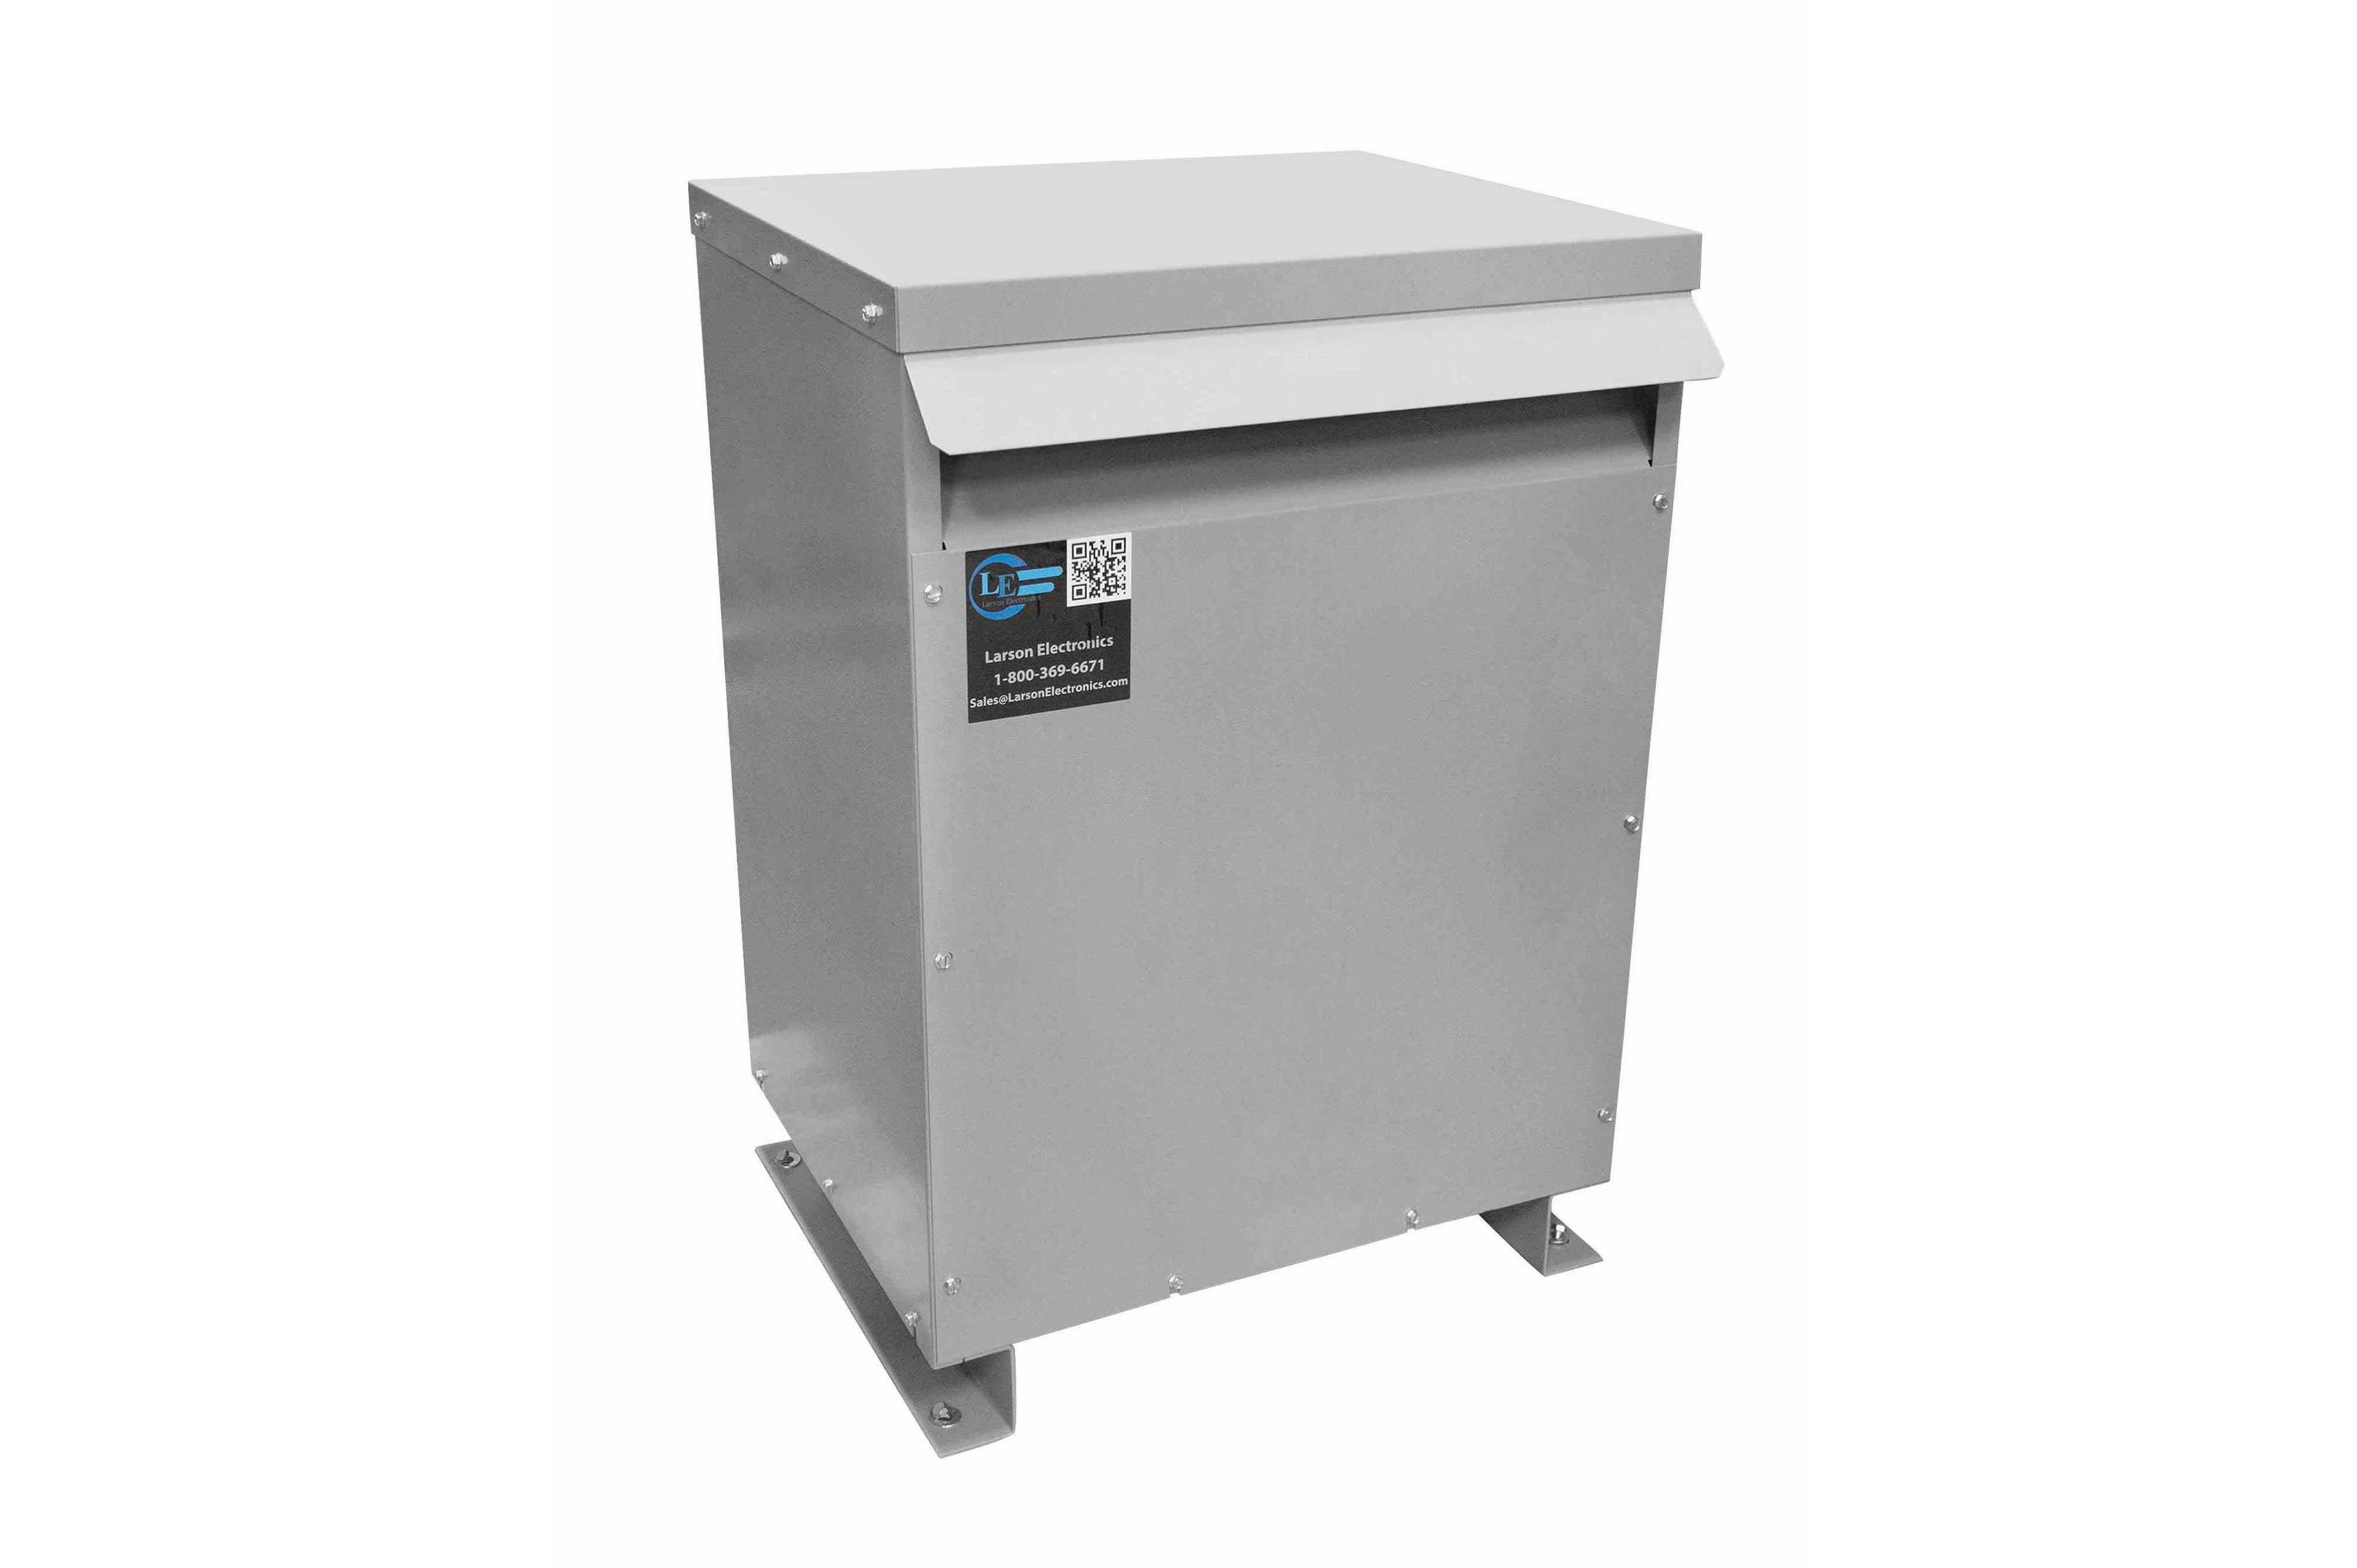 300 kVA 3PH DOE Transformer, 230V Delta Primary, 208Y/120 Wye-N Secondary, N3R, Ventilated, 60 Hz